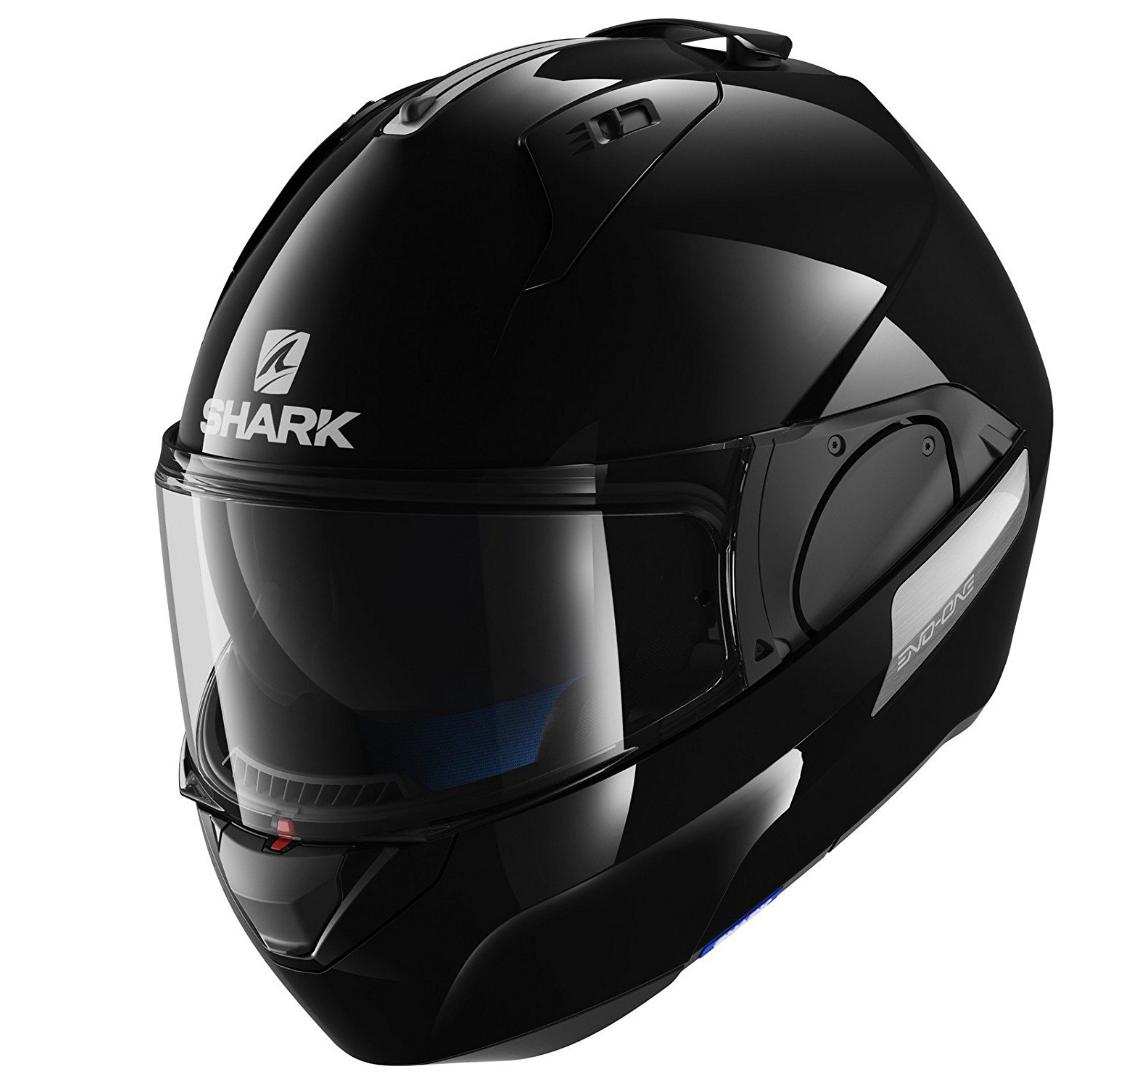 Shark Evo One Black Helmet